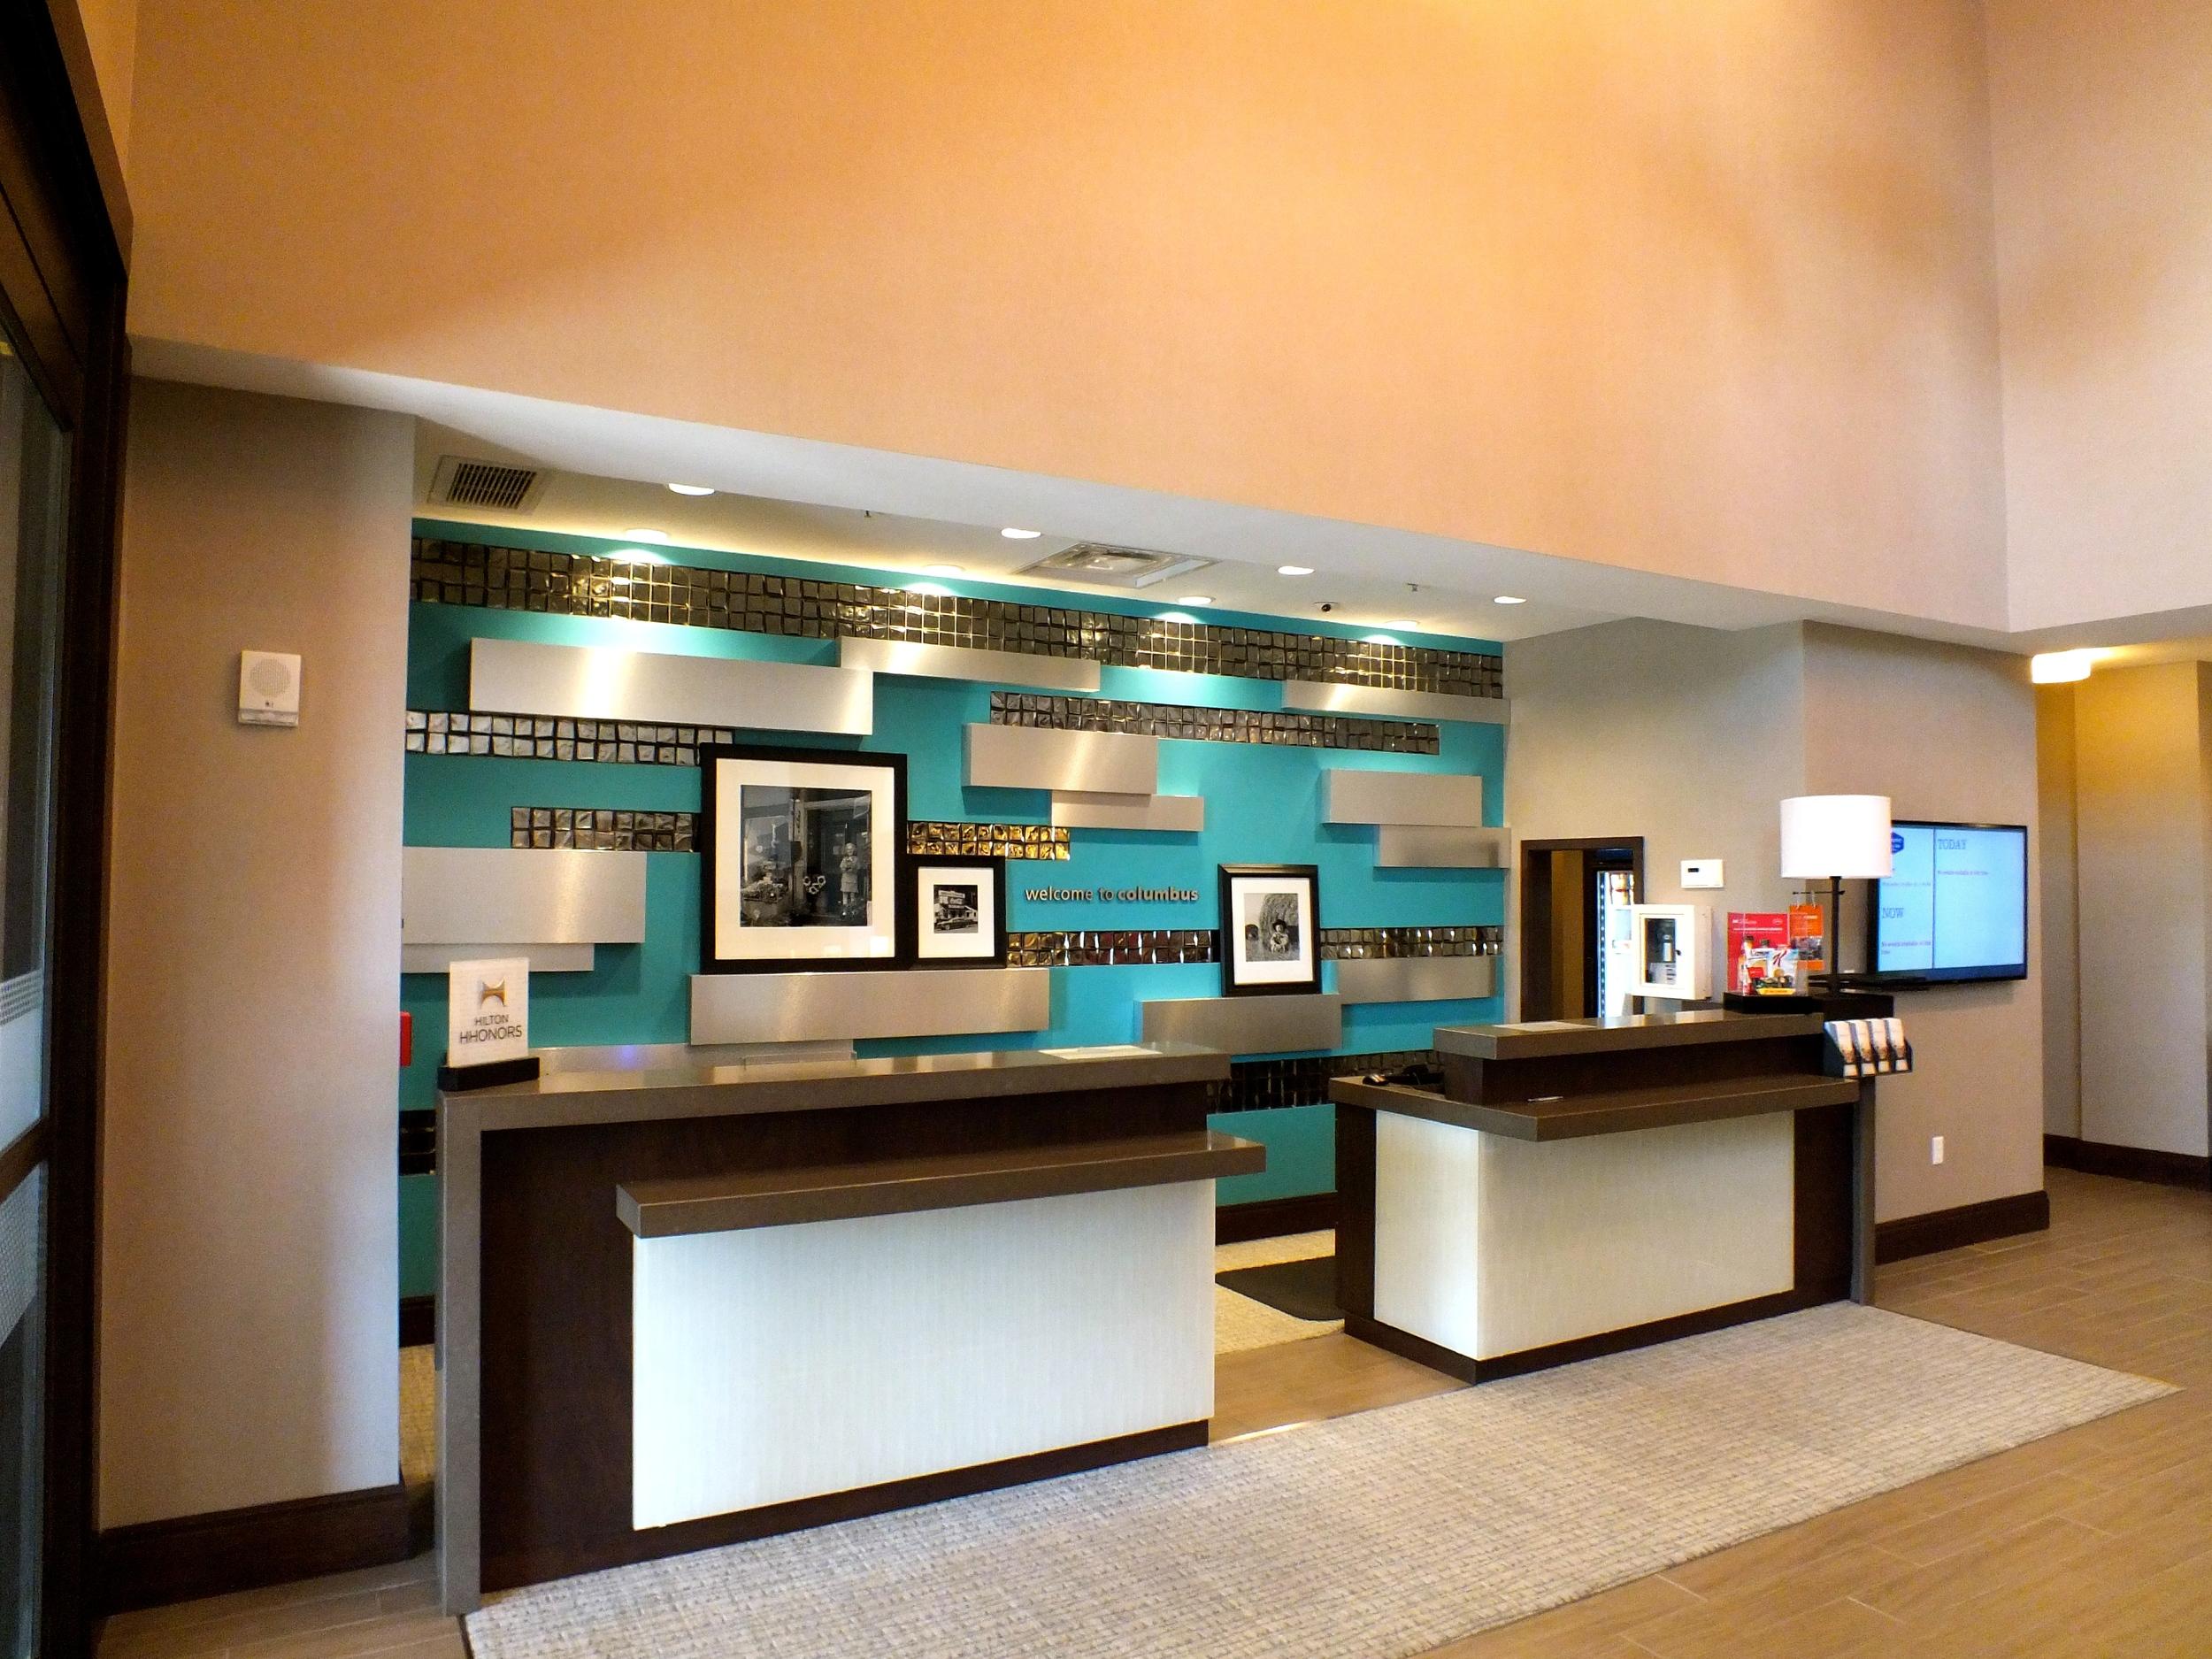 Hampton Inn & Suites - Olentangy |  Columbus, OH